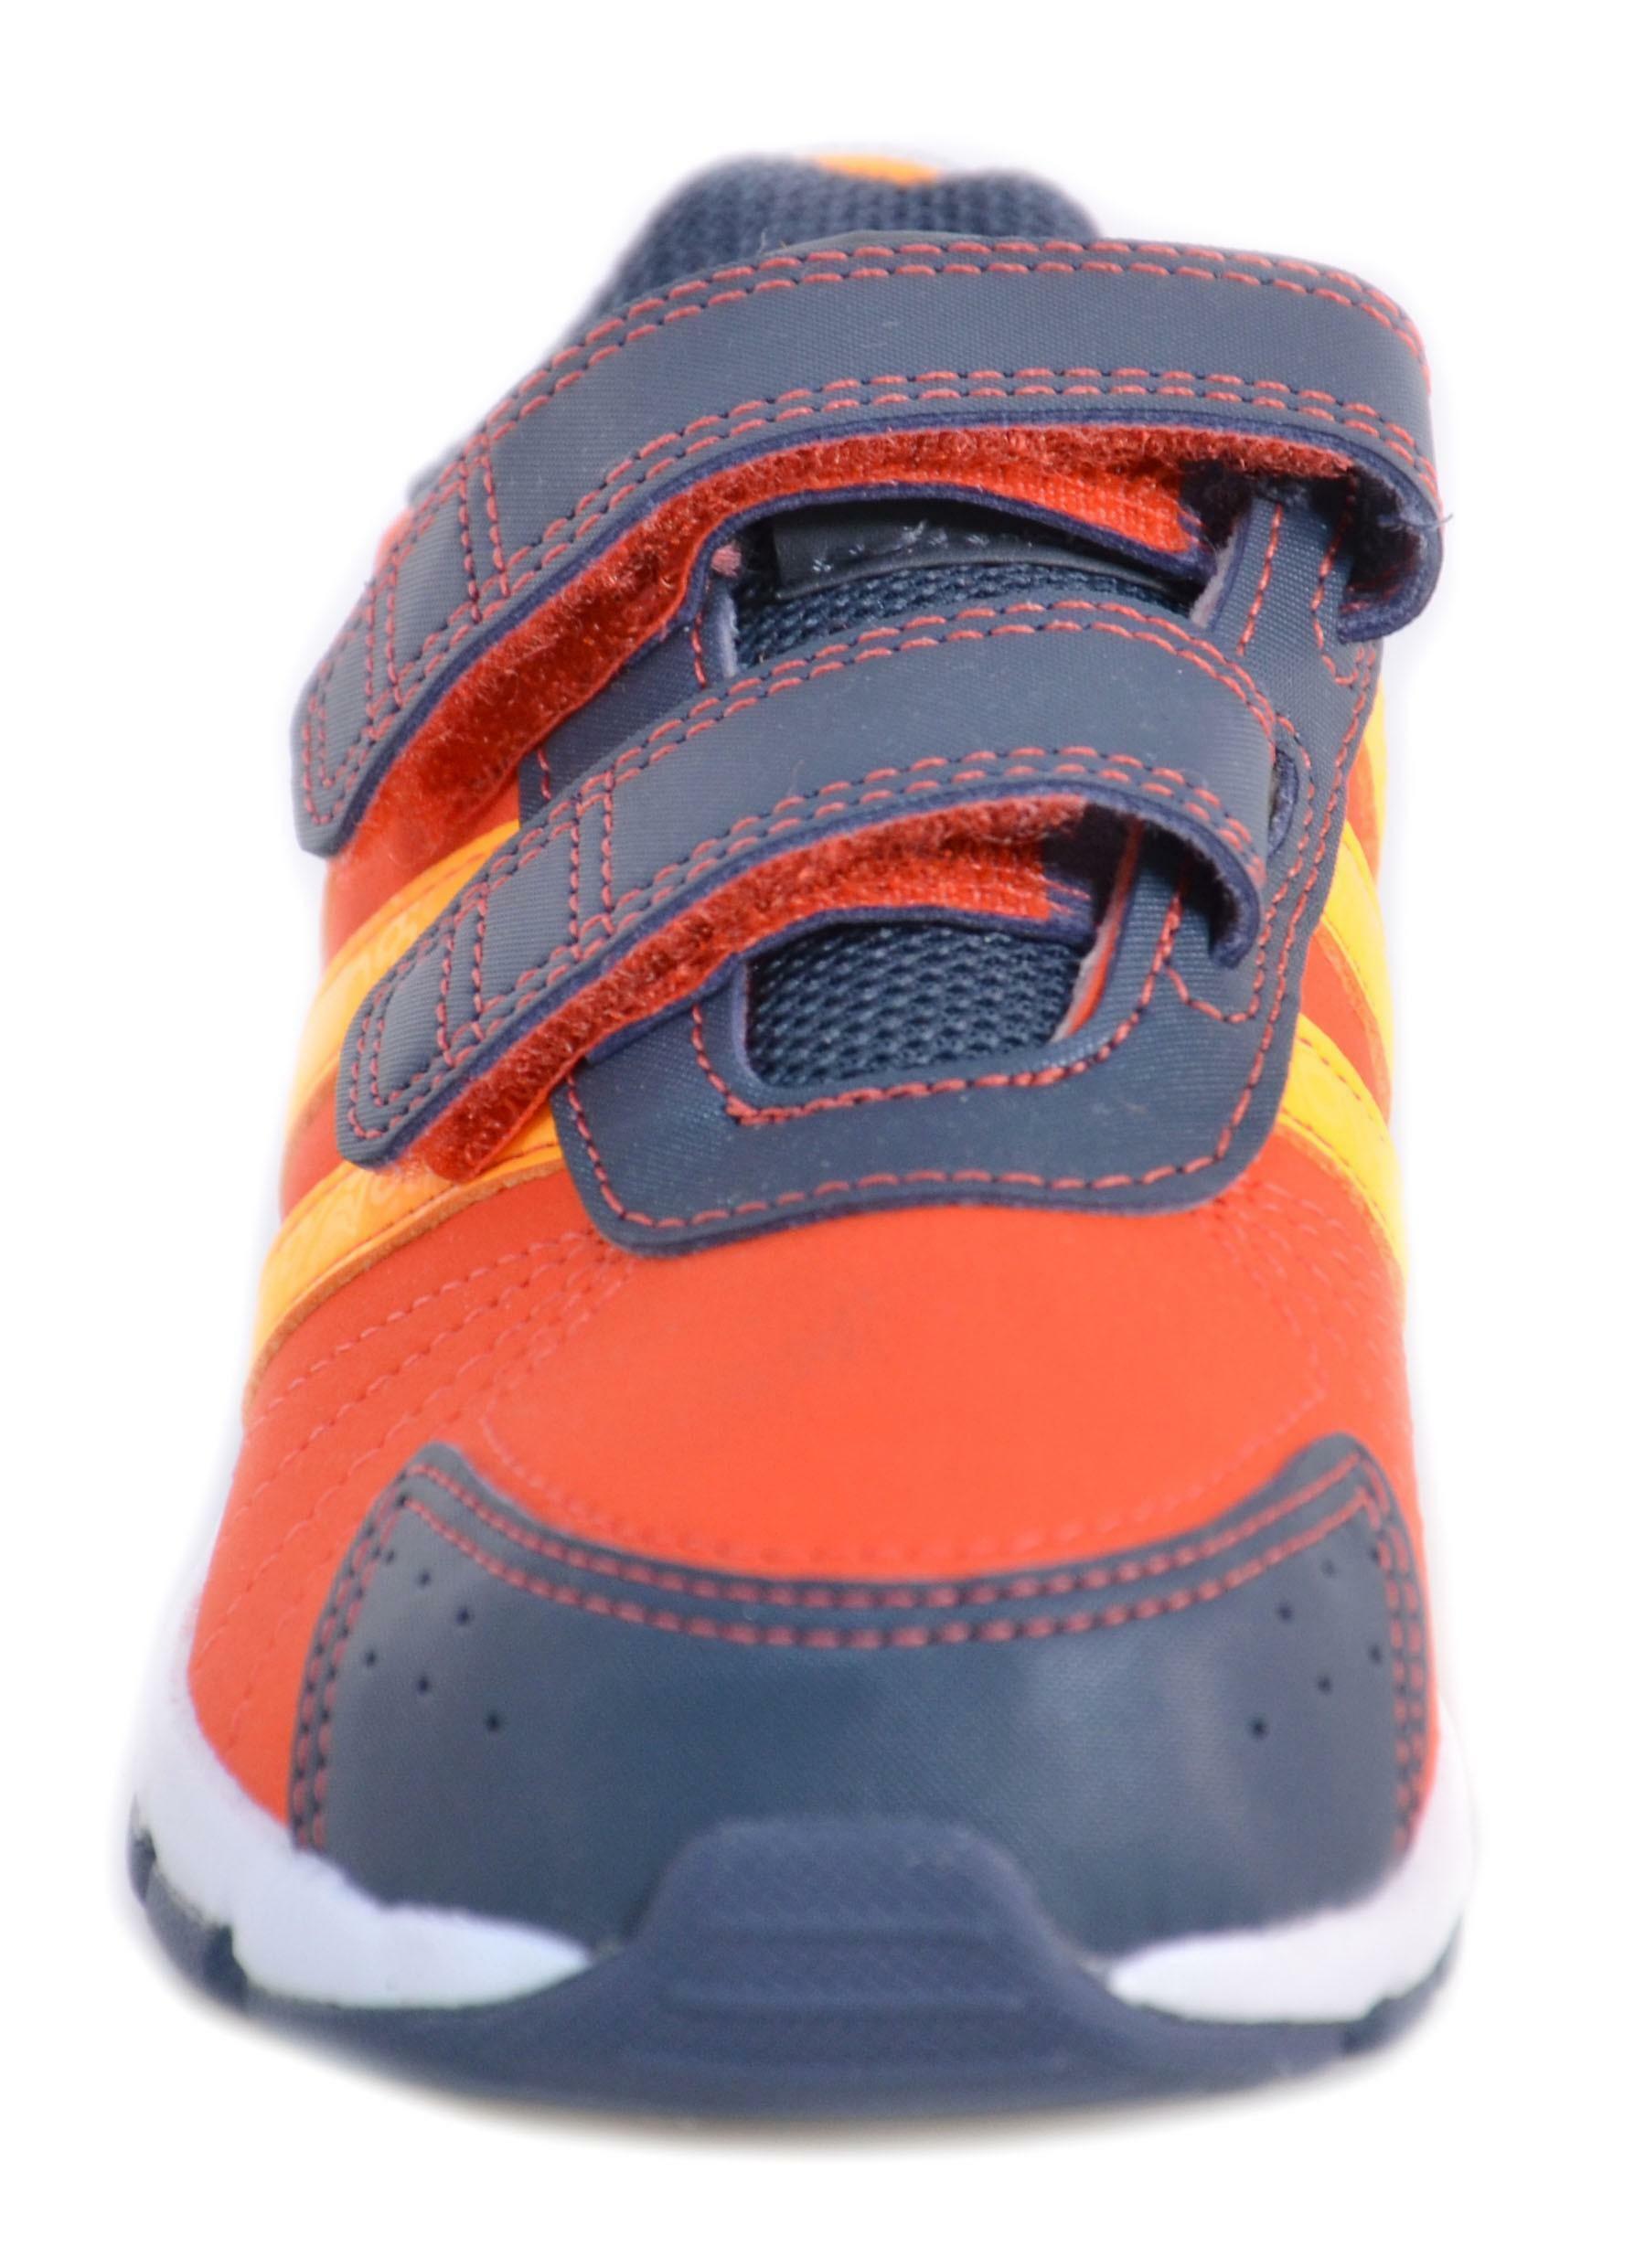 adidas adidas snice 3 cf i scarpe bambino arancio pelle strappi m20085